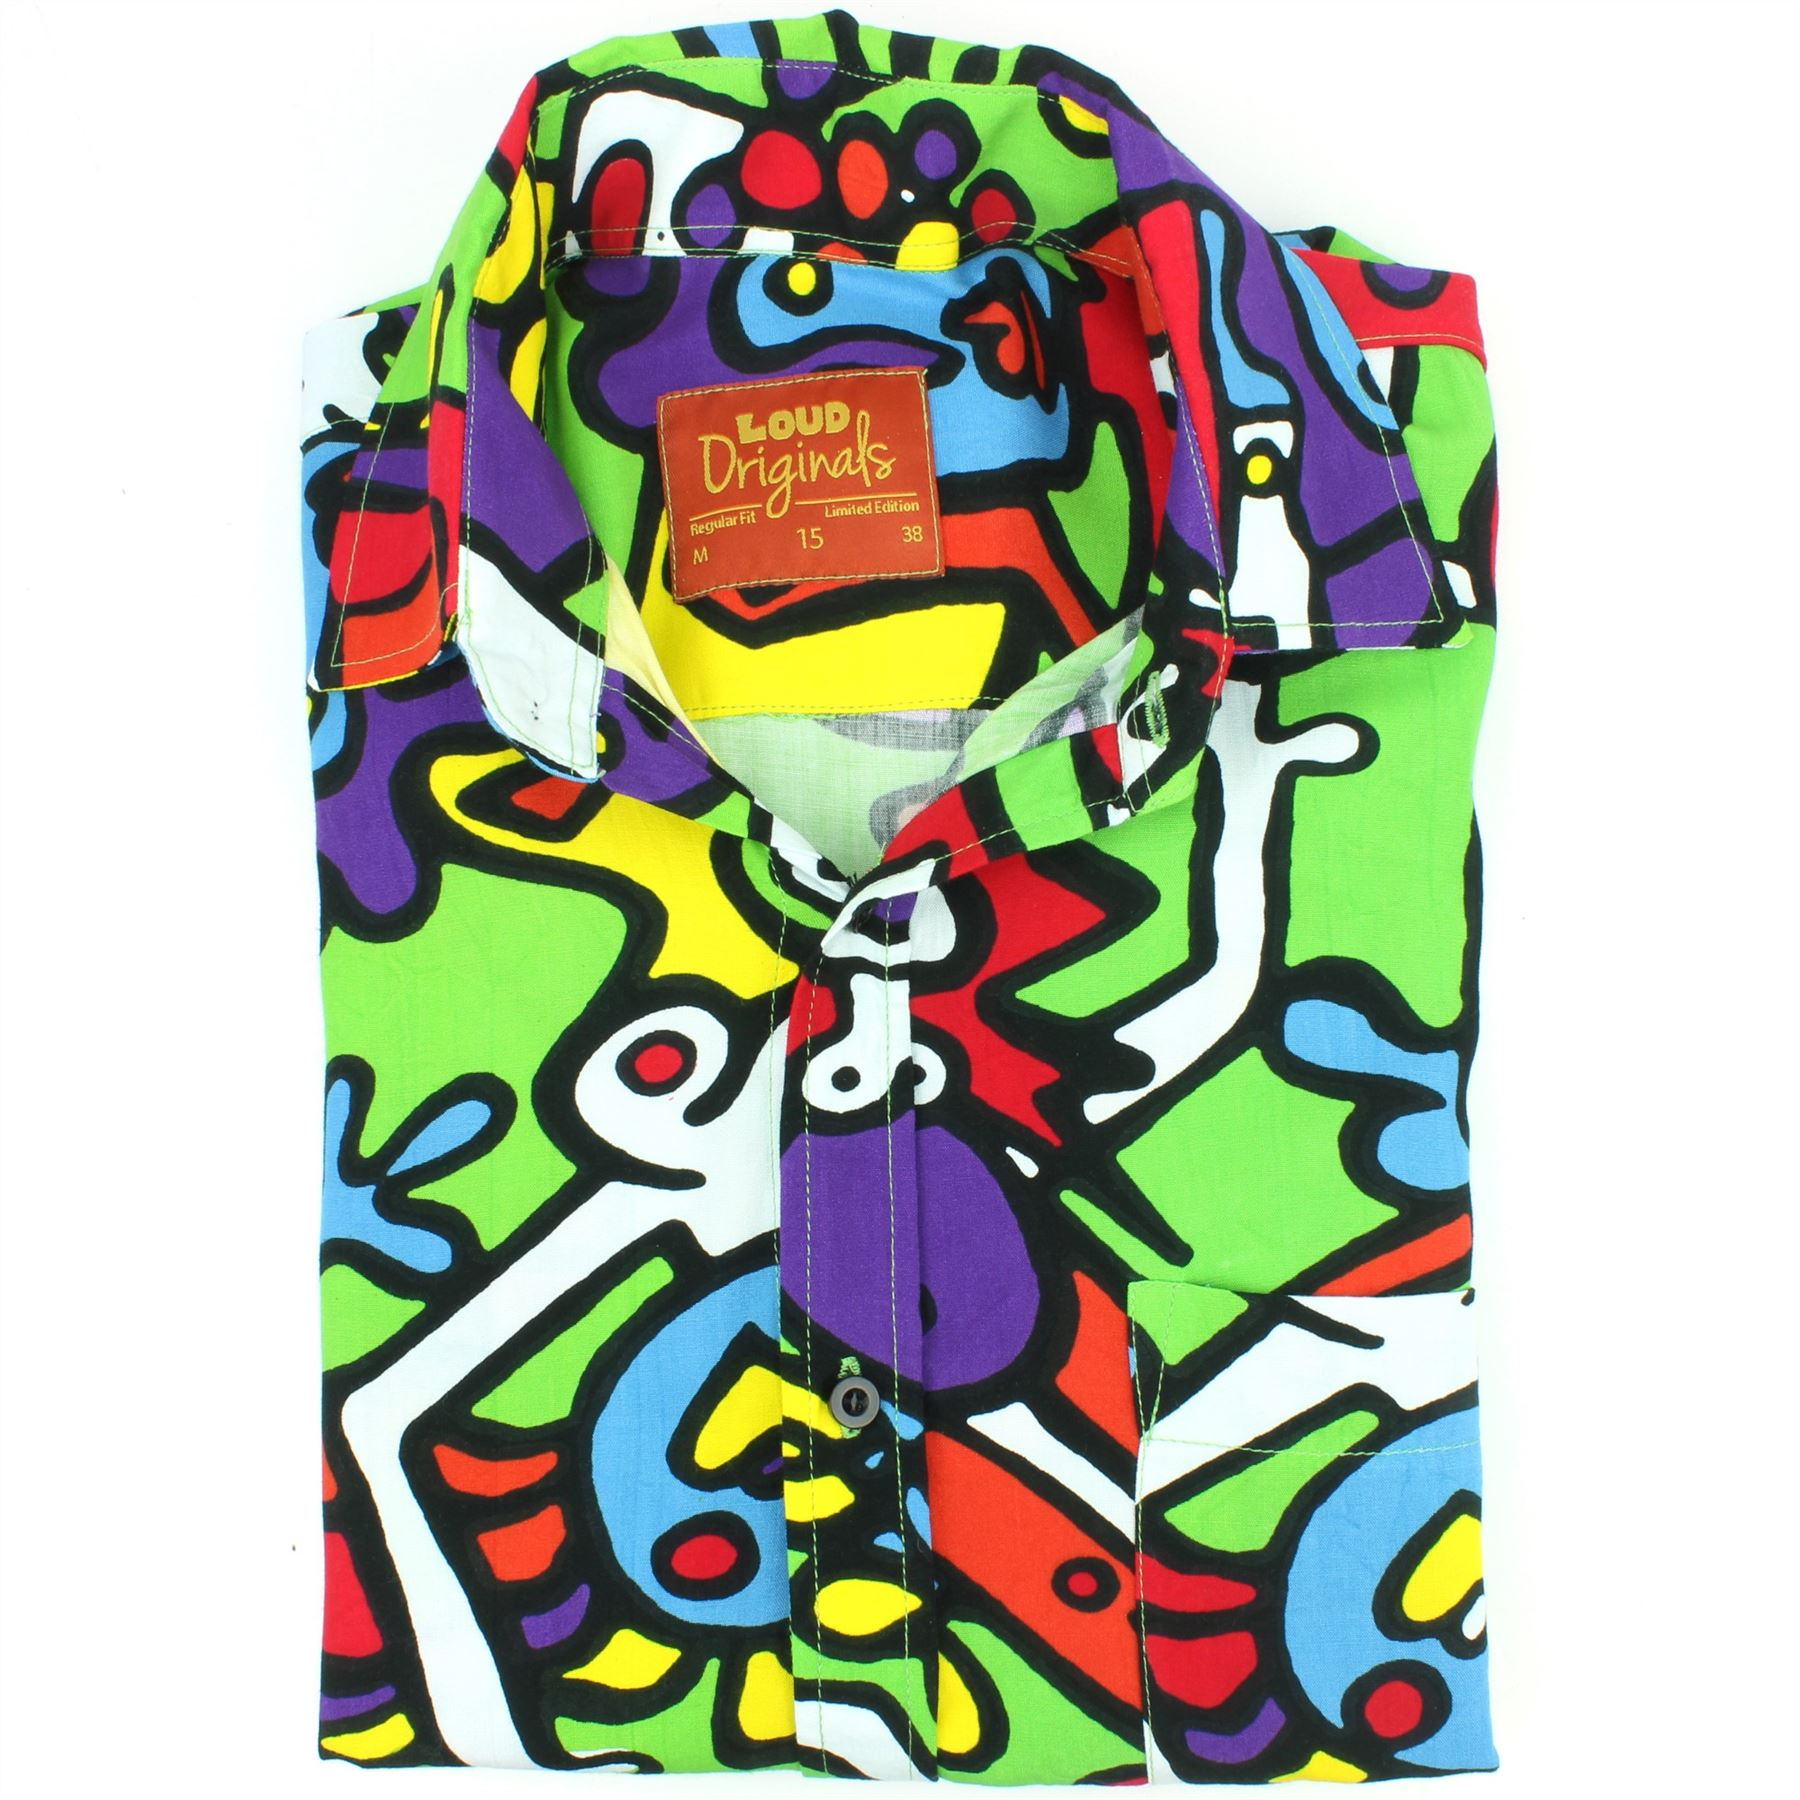 Mens-Shirt-Loud-Originals-Rayon-REGULAR-FIT-Long-Sleeve-TIFFY-PRINT-Retro-Dance thumbnail 8